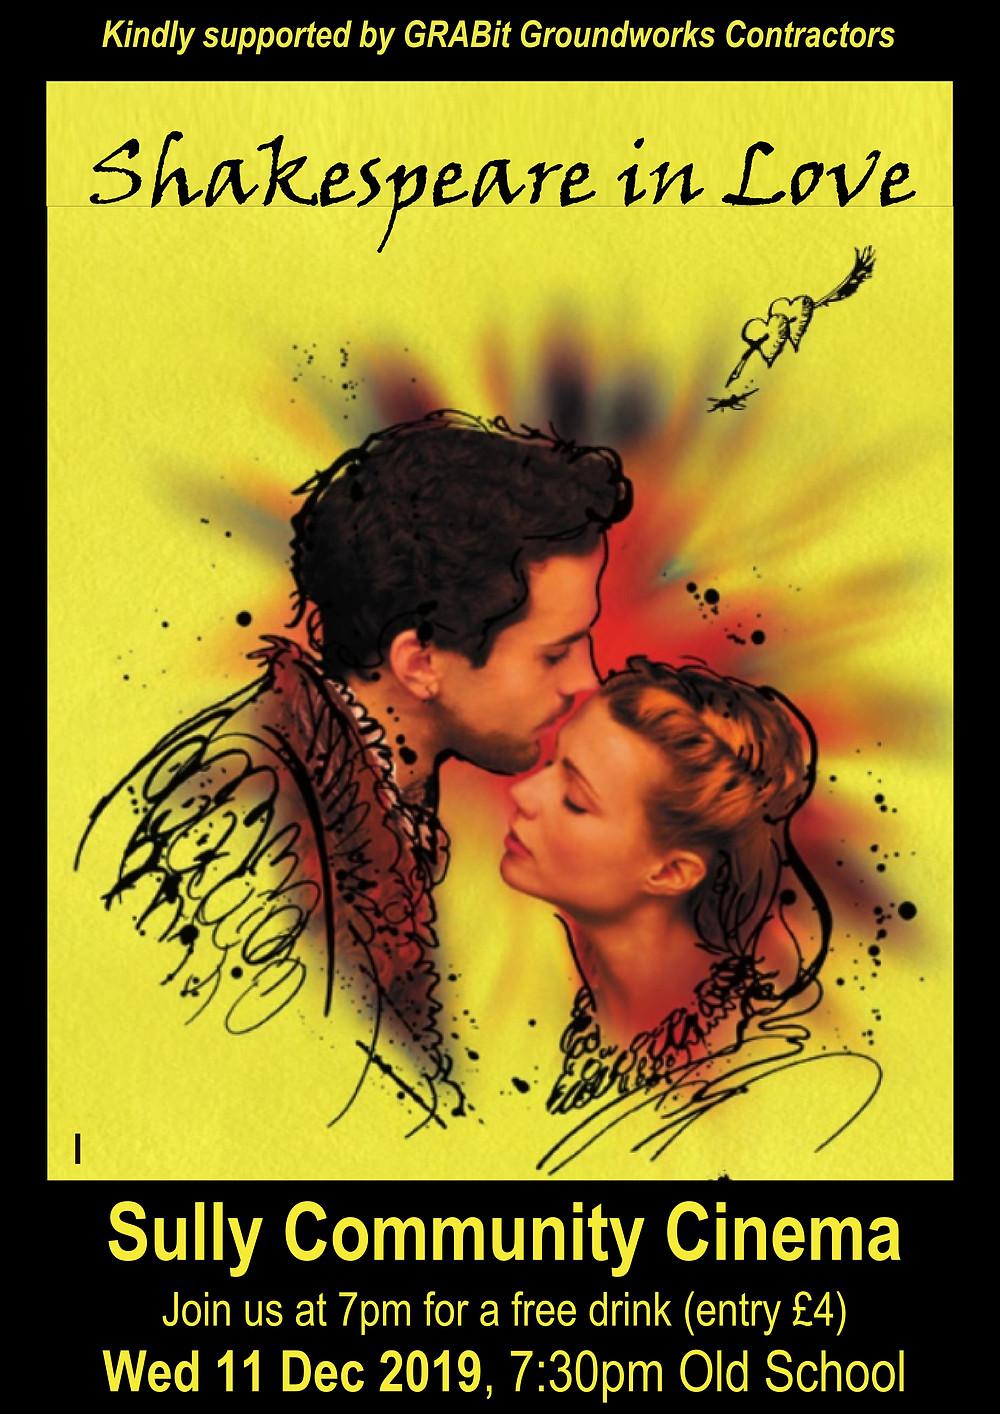 Poster for Cinema, Shakespeare in Love